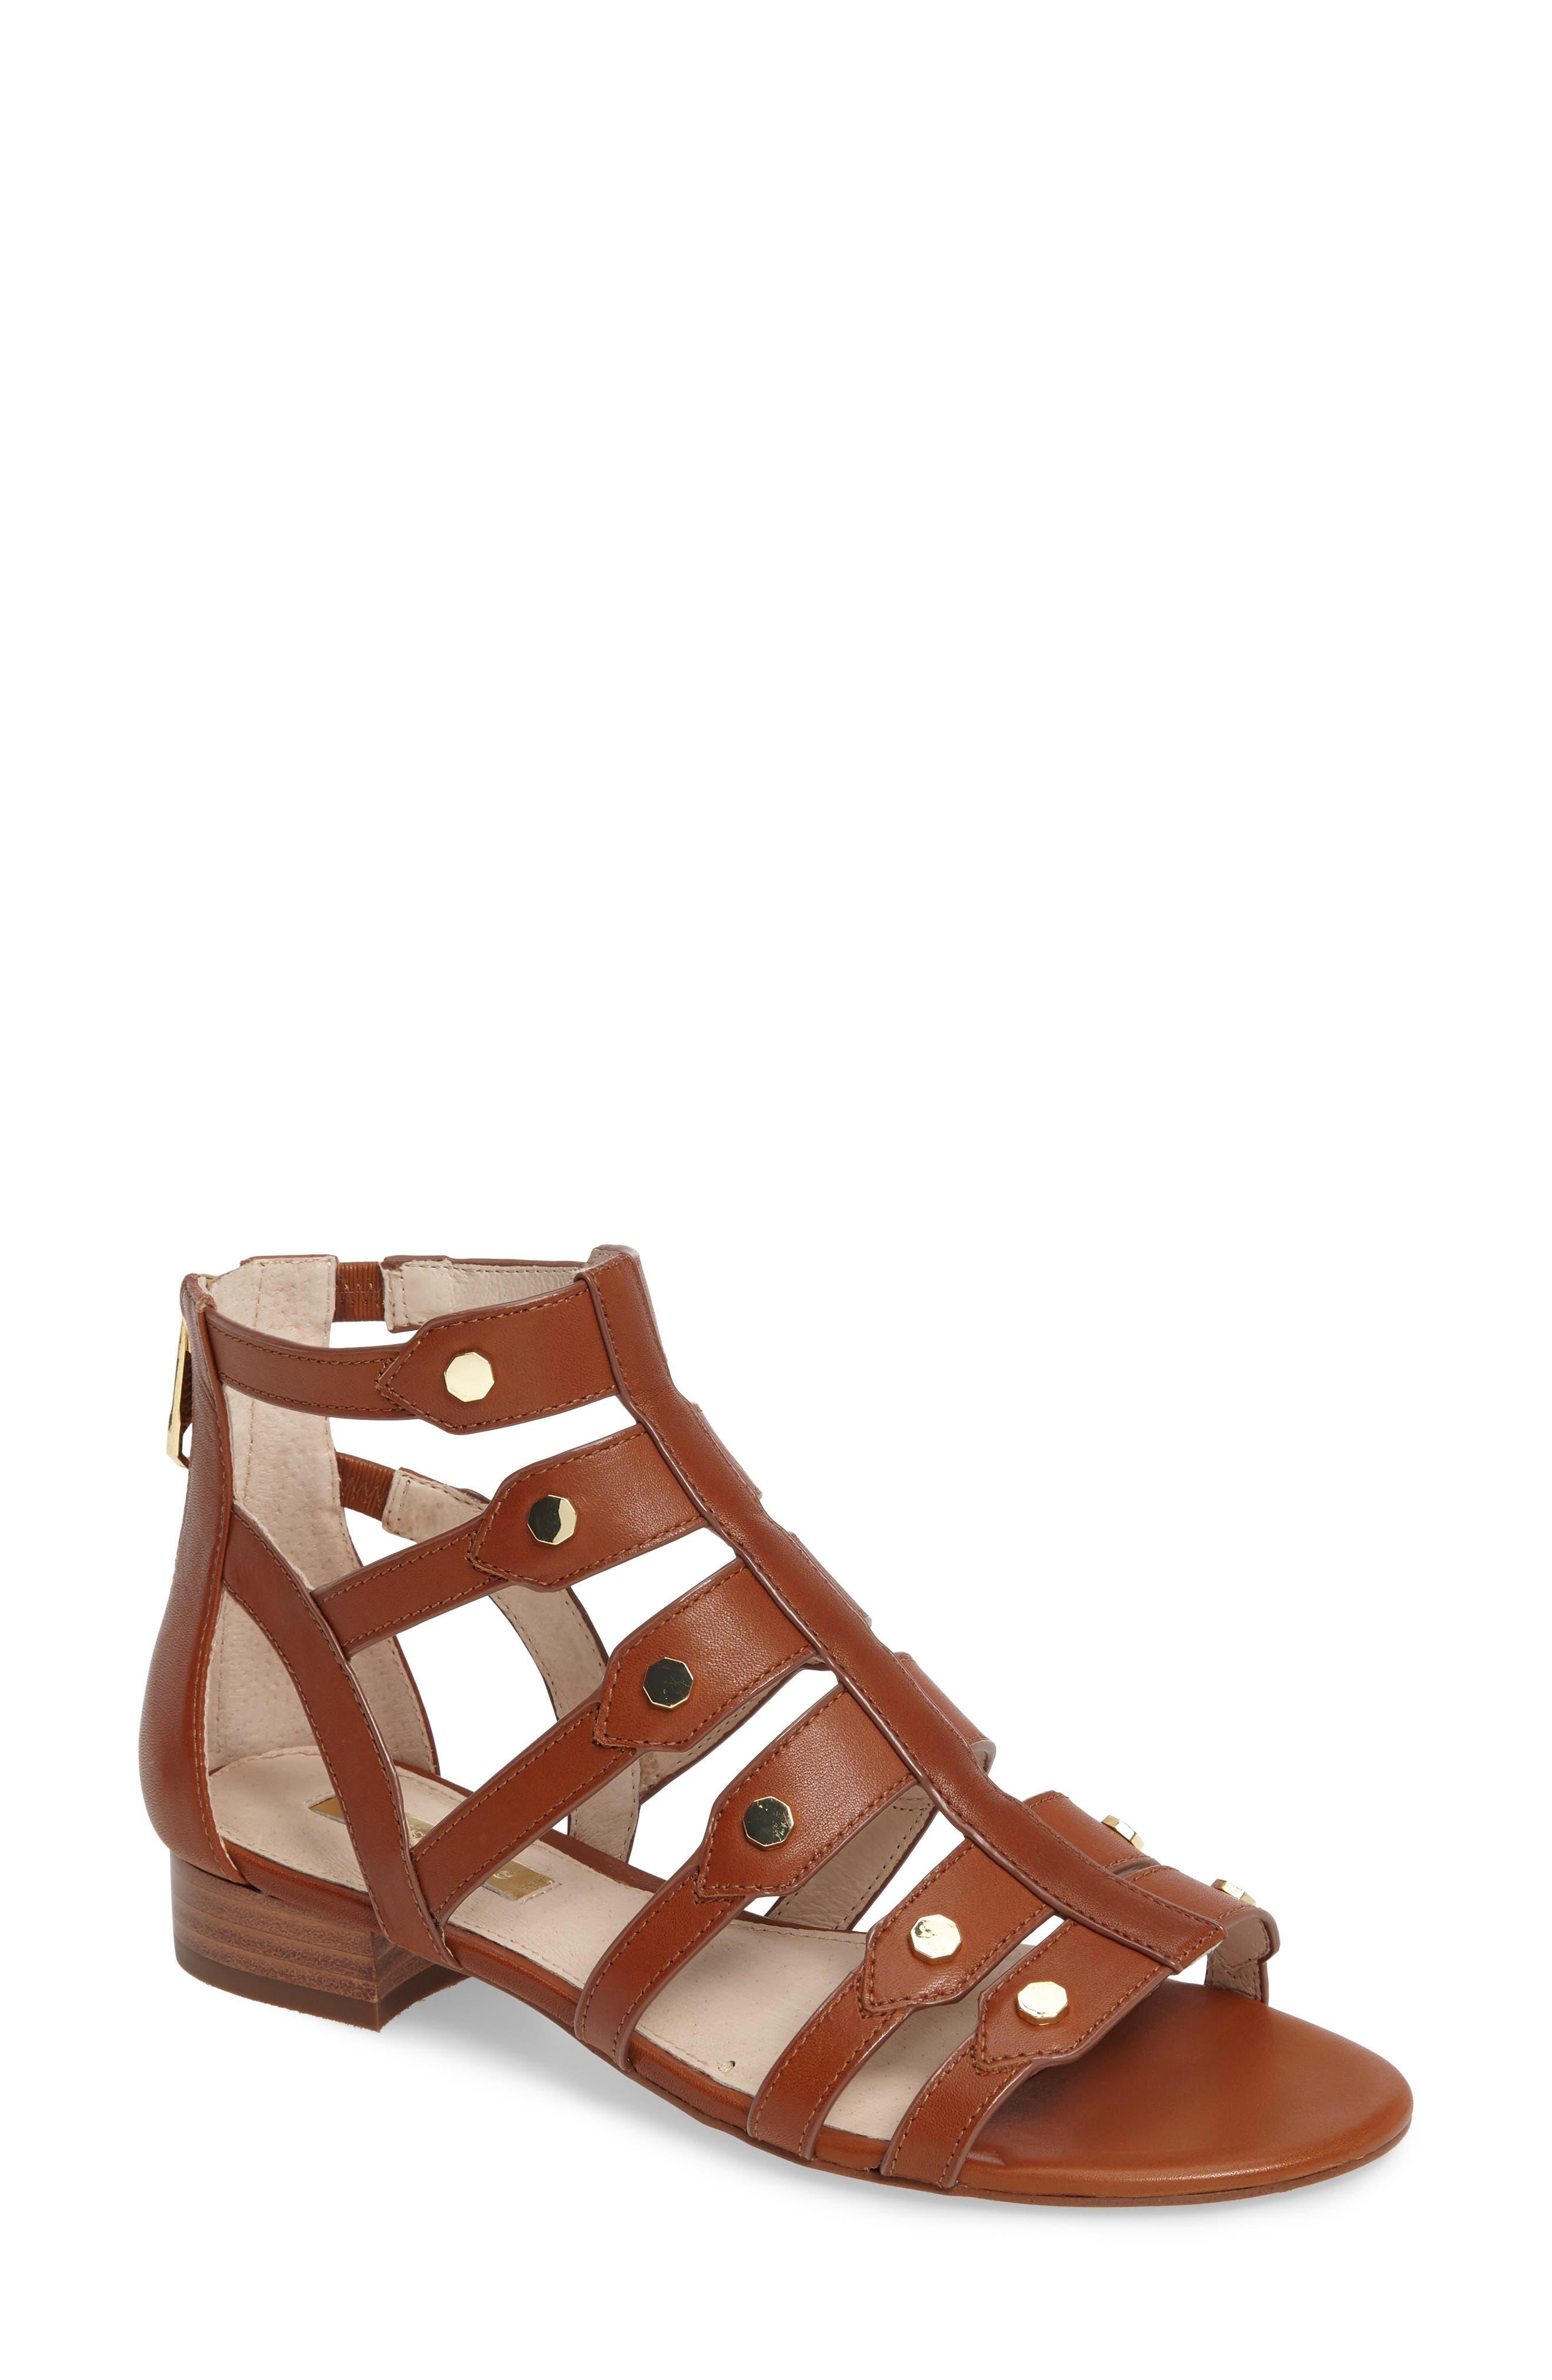 Alternate Image 1 Selected - Louise et Cie Aria Studded Gladiator Sandal (Women)